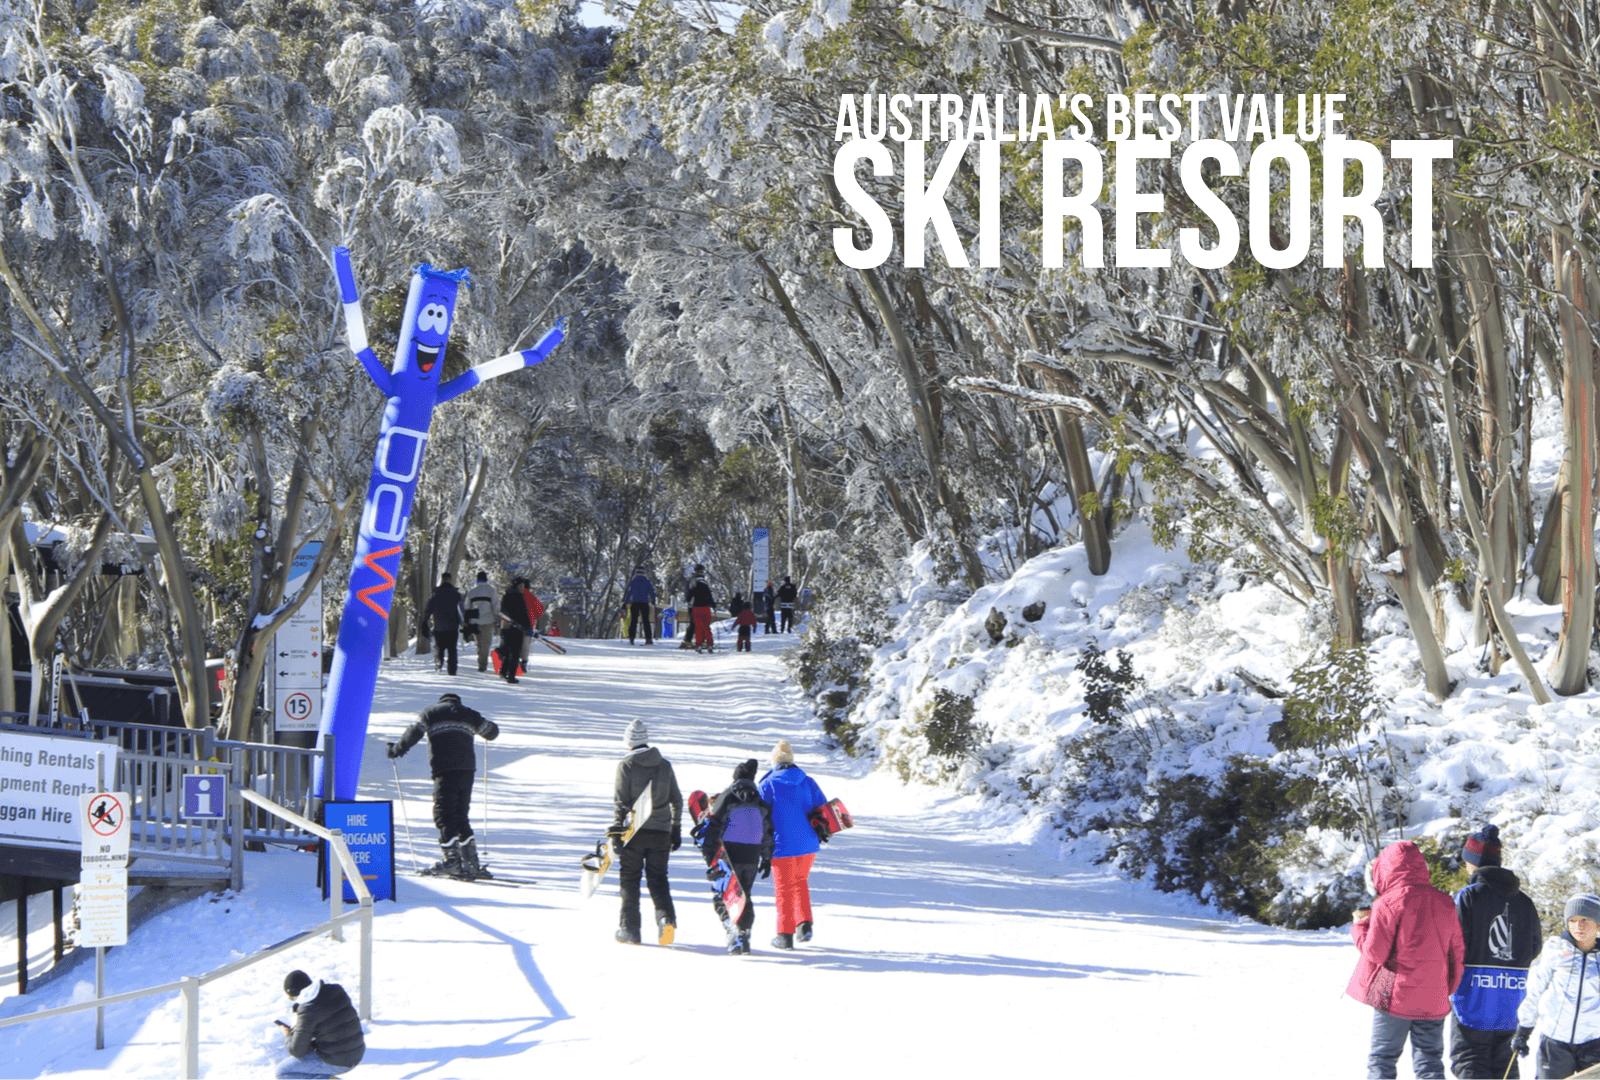 Mt Baw Baw Village - Australia Best Value Ski Resort